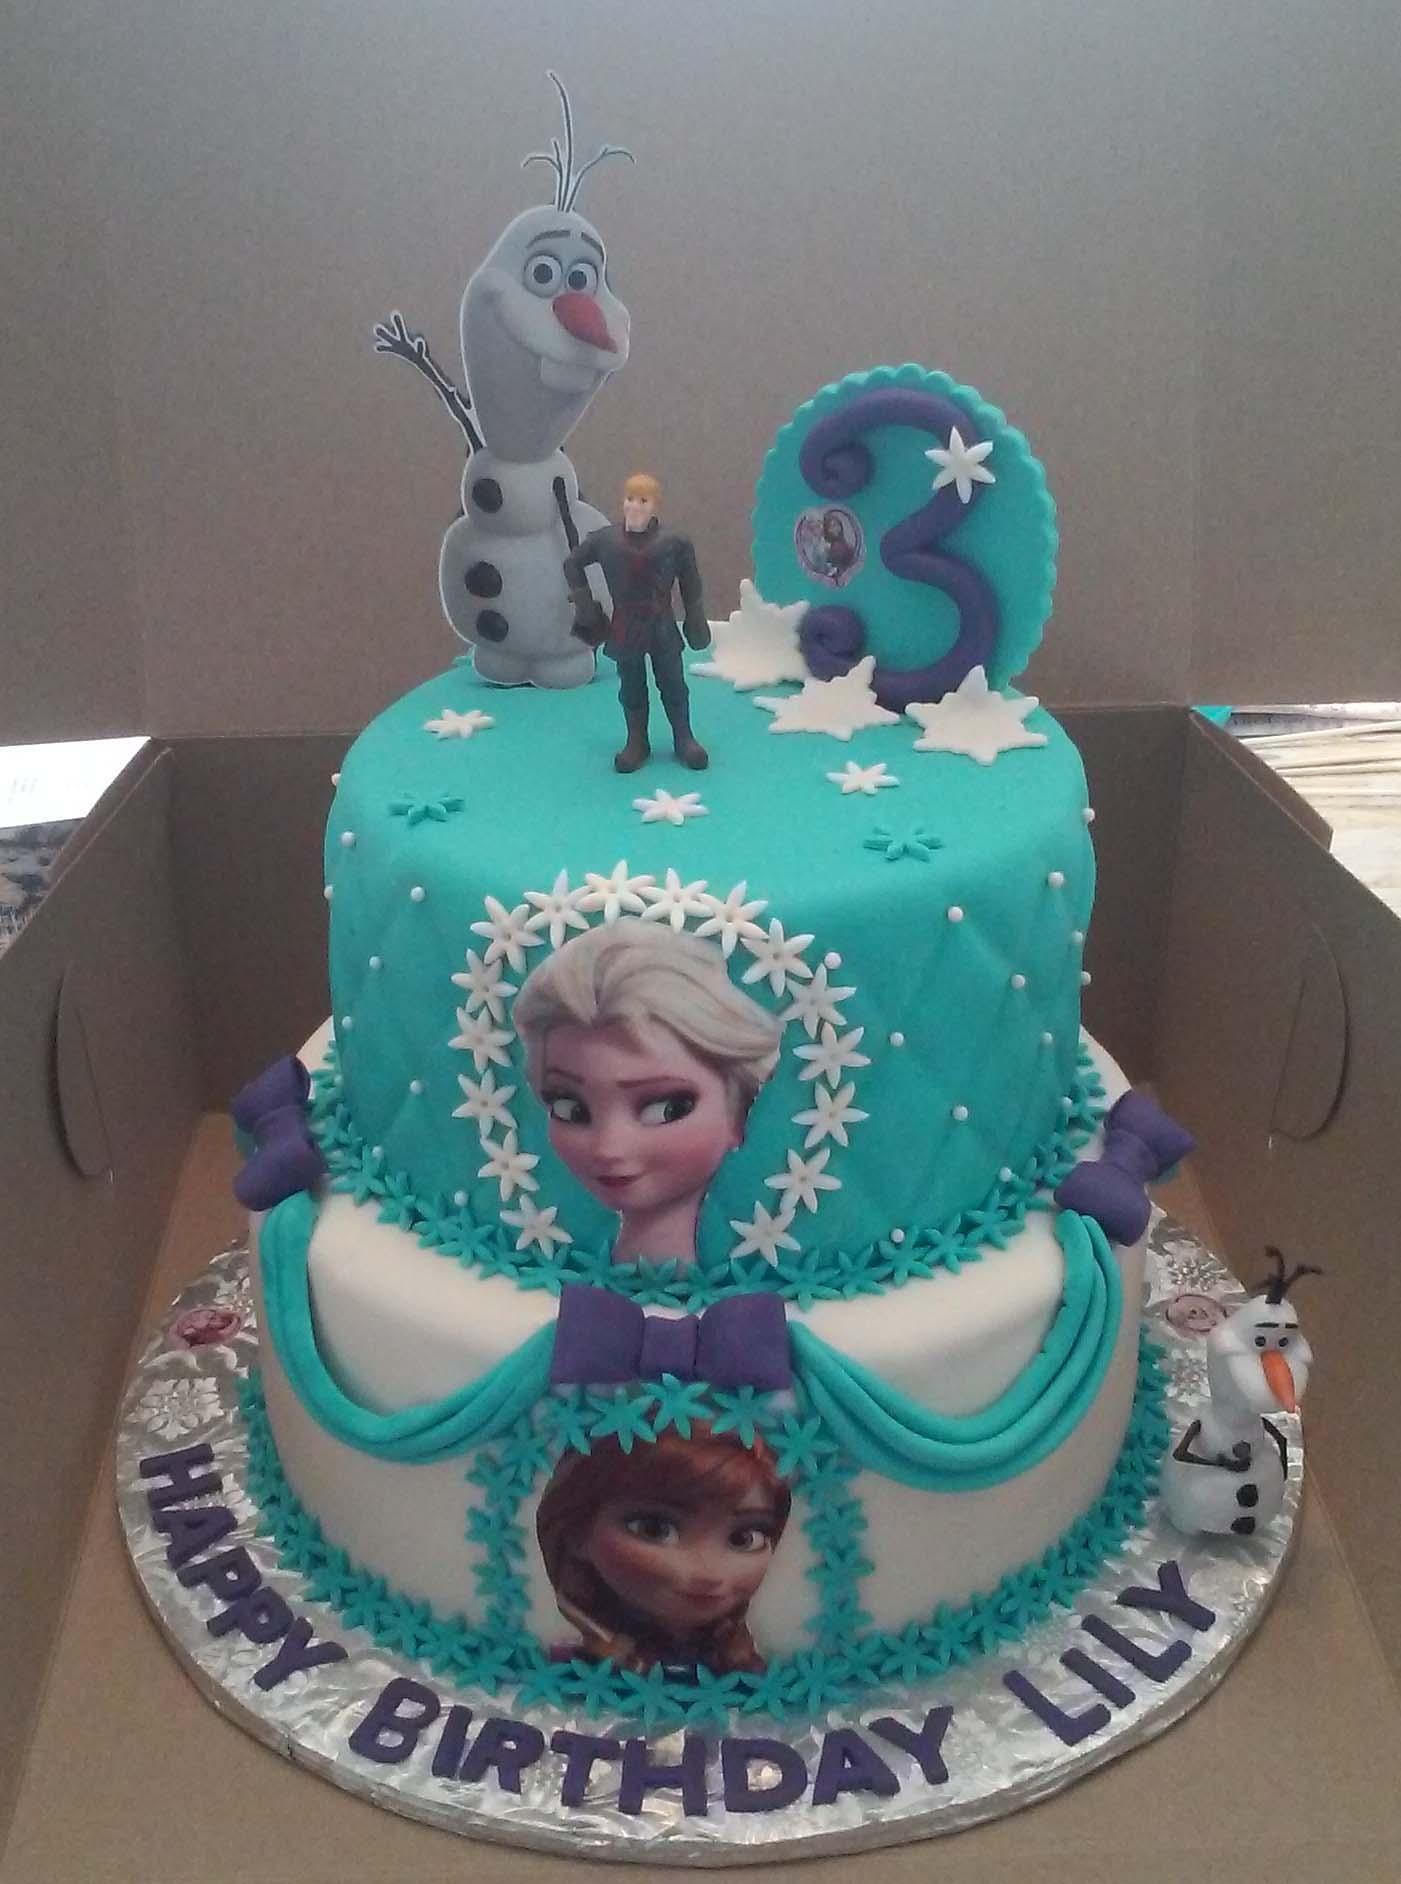 7 3 Tier Birthday Cakes Frozen Elsa Photo Three Tier Birthday Cake